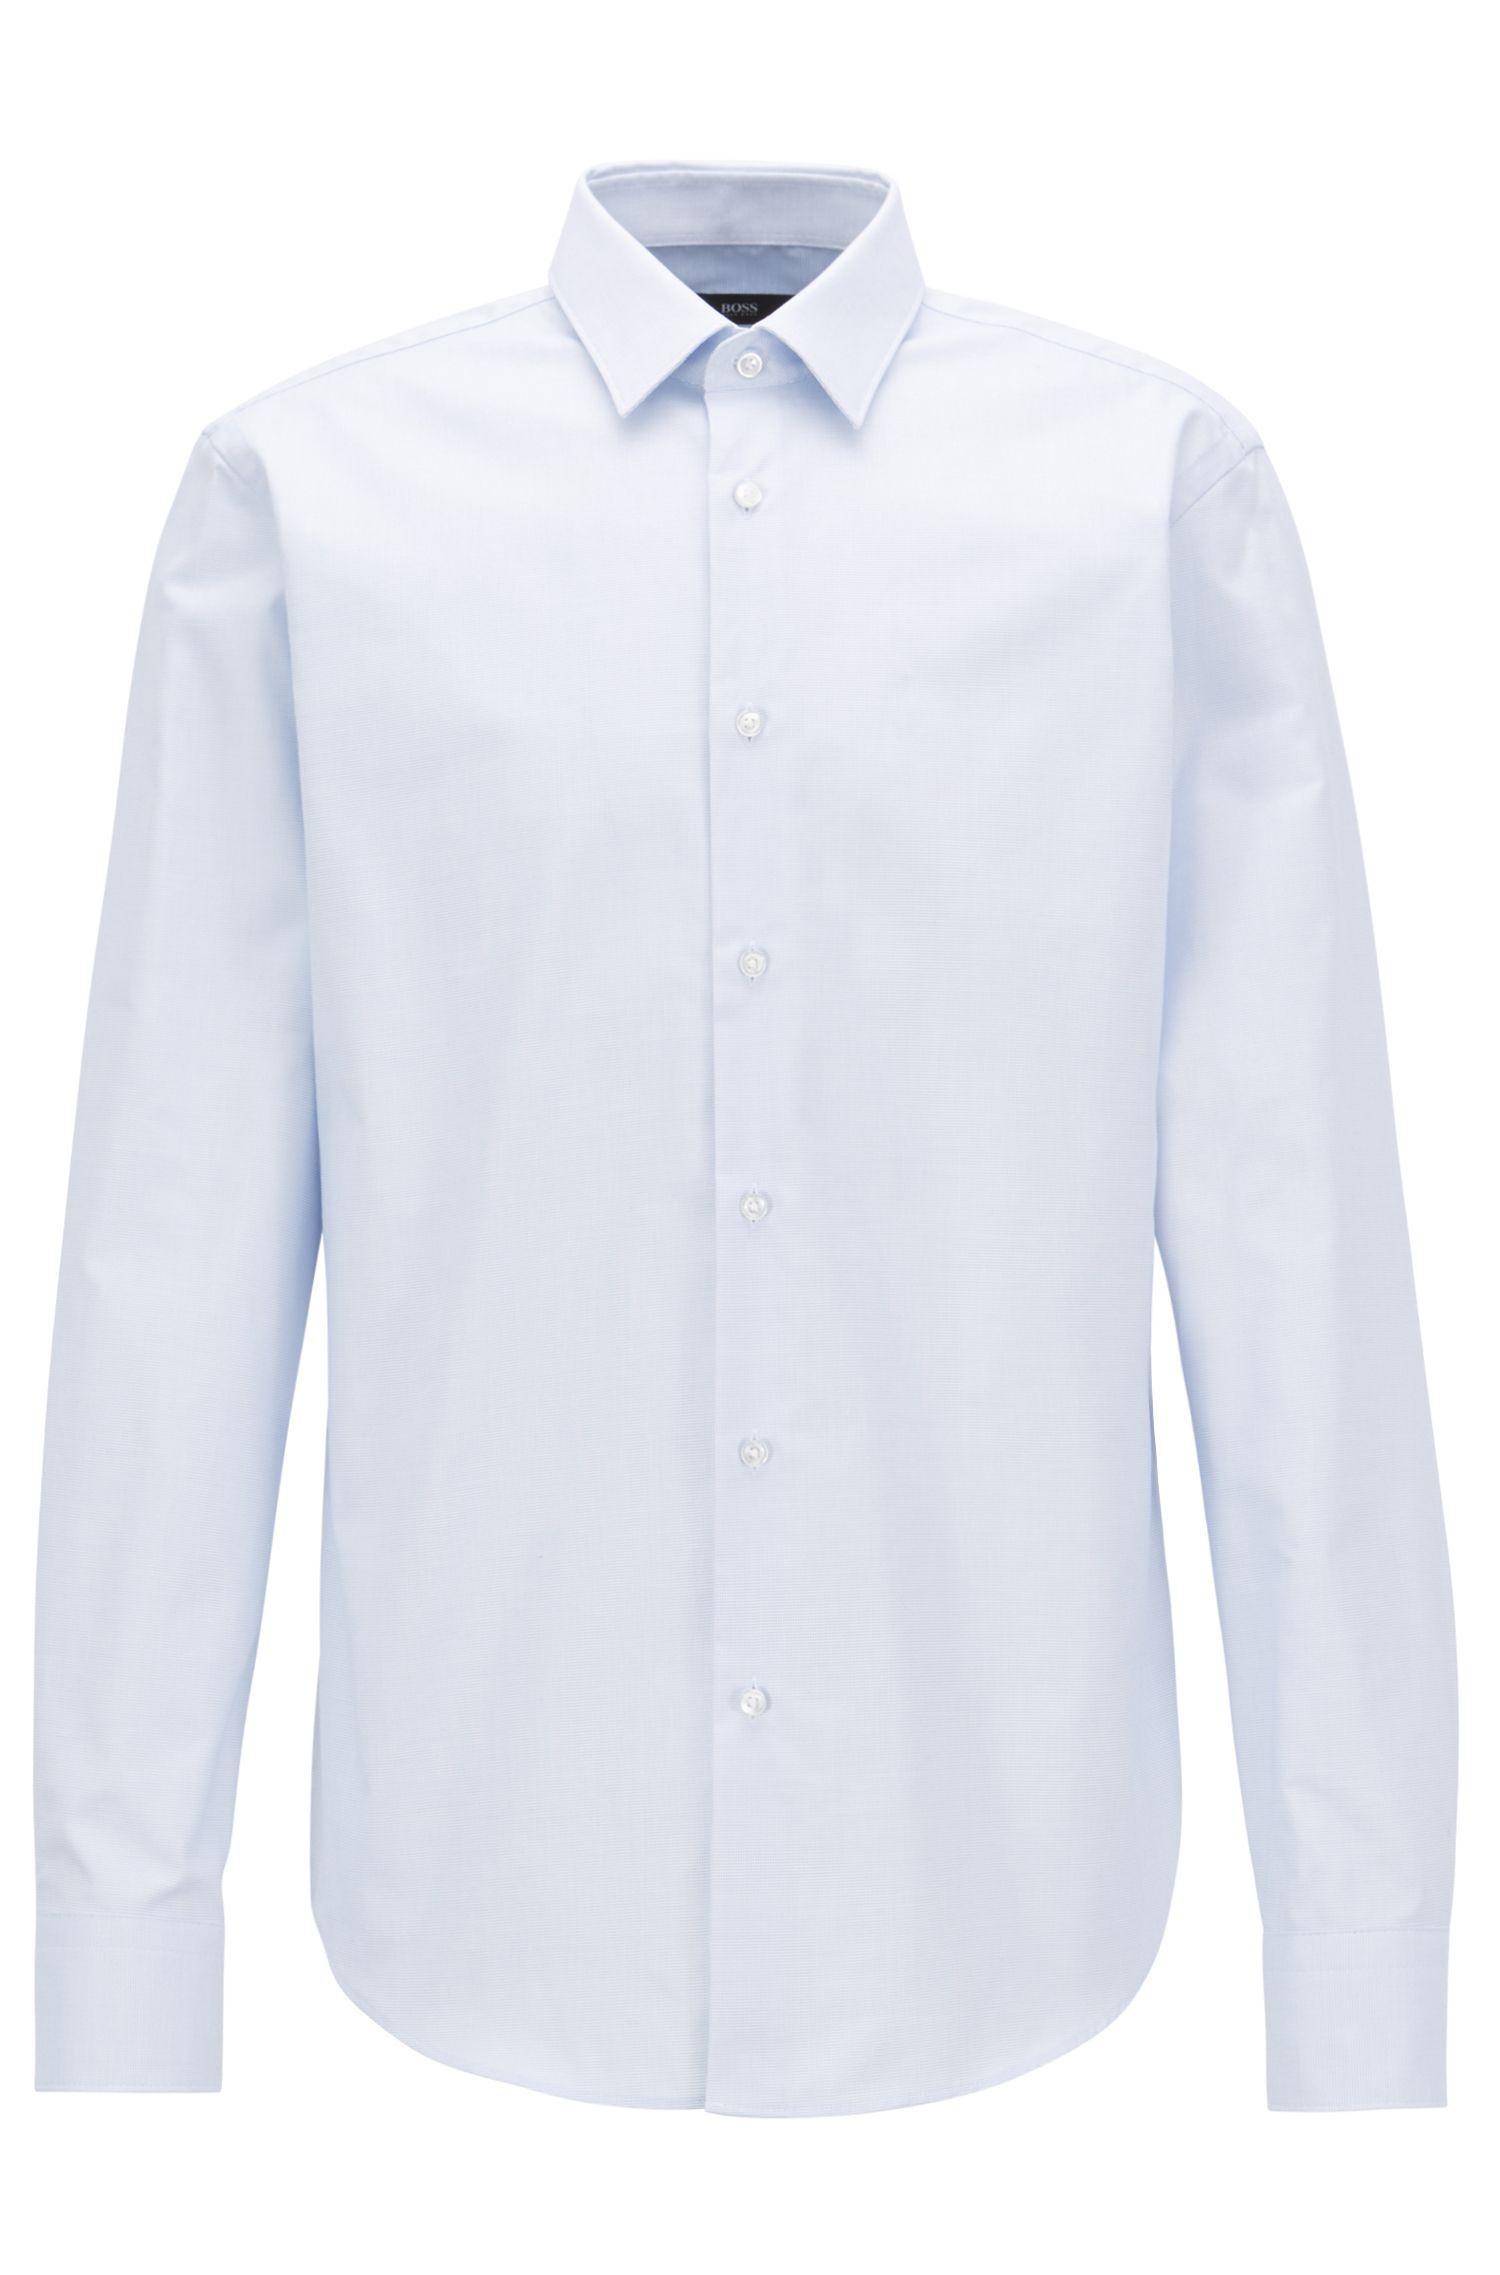 Regular-fit shirt in Fresh Active cotton, Light Blue